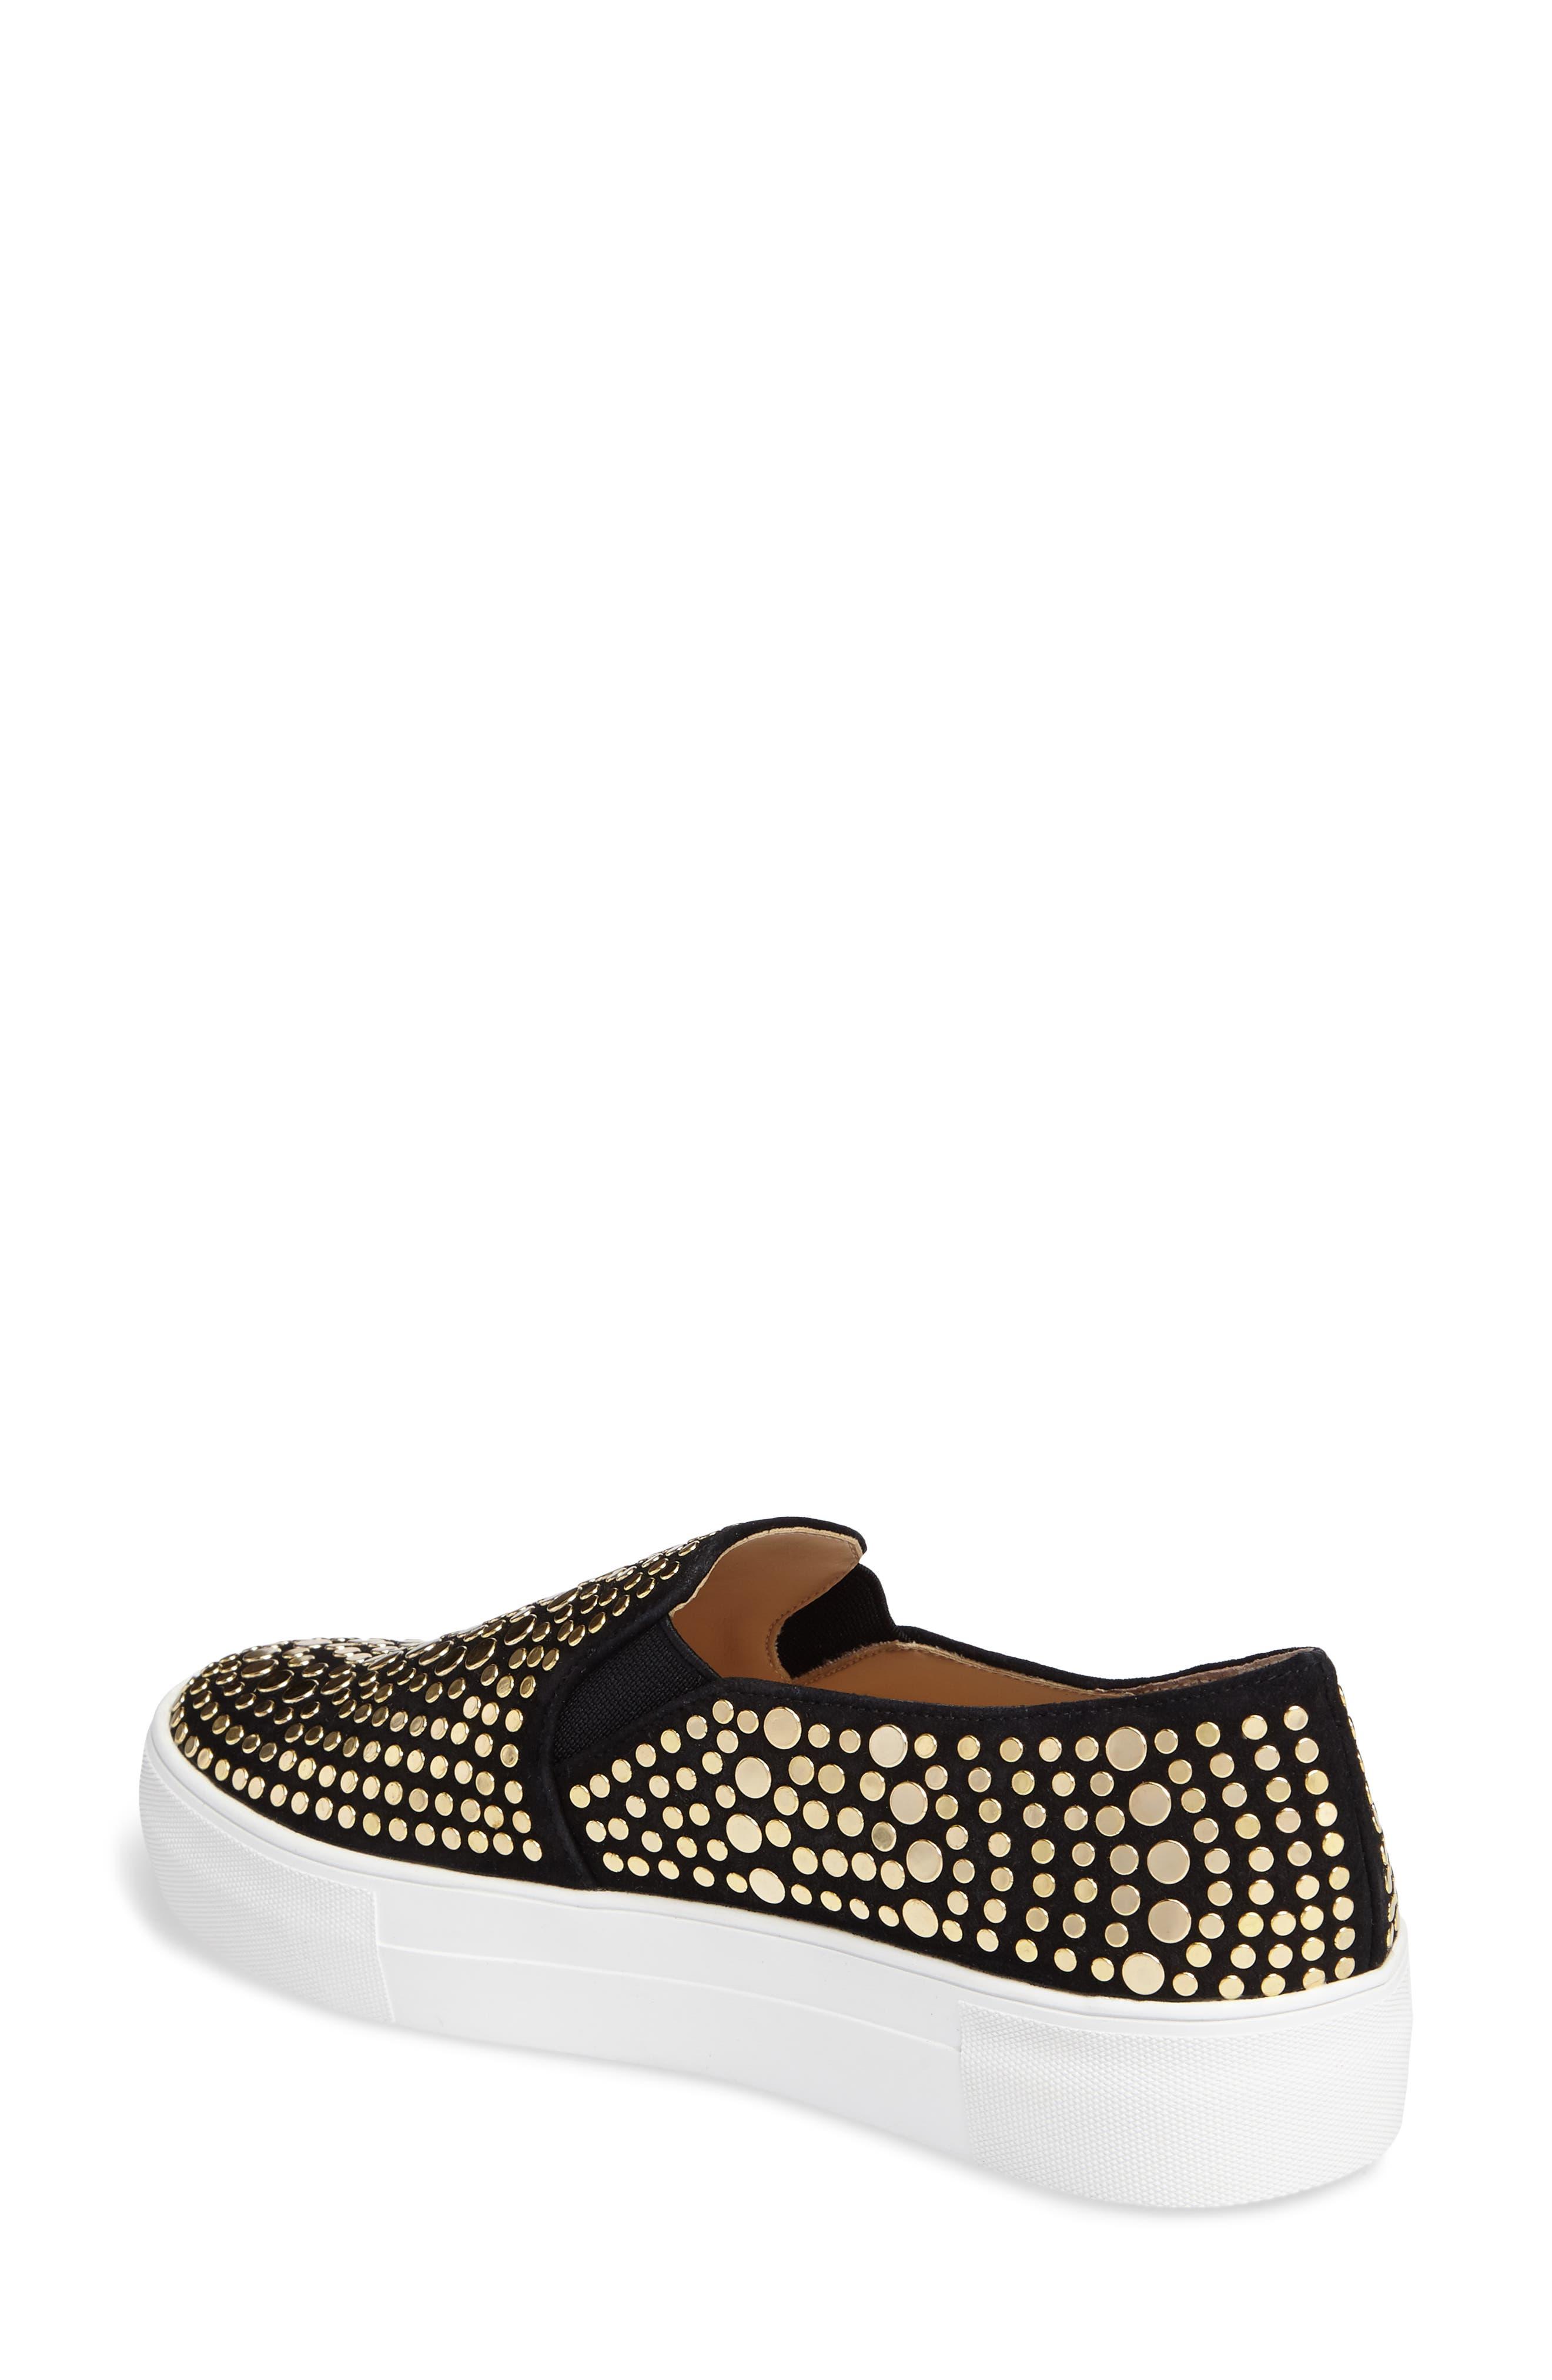 Kindra Stud Slip-On Sneaker,                             Alternate thumbnail 2, color,                             Black Suede